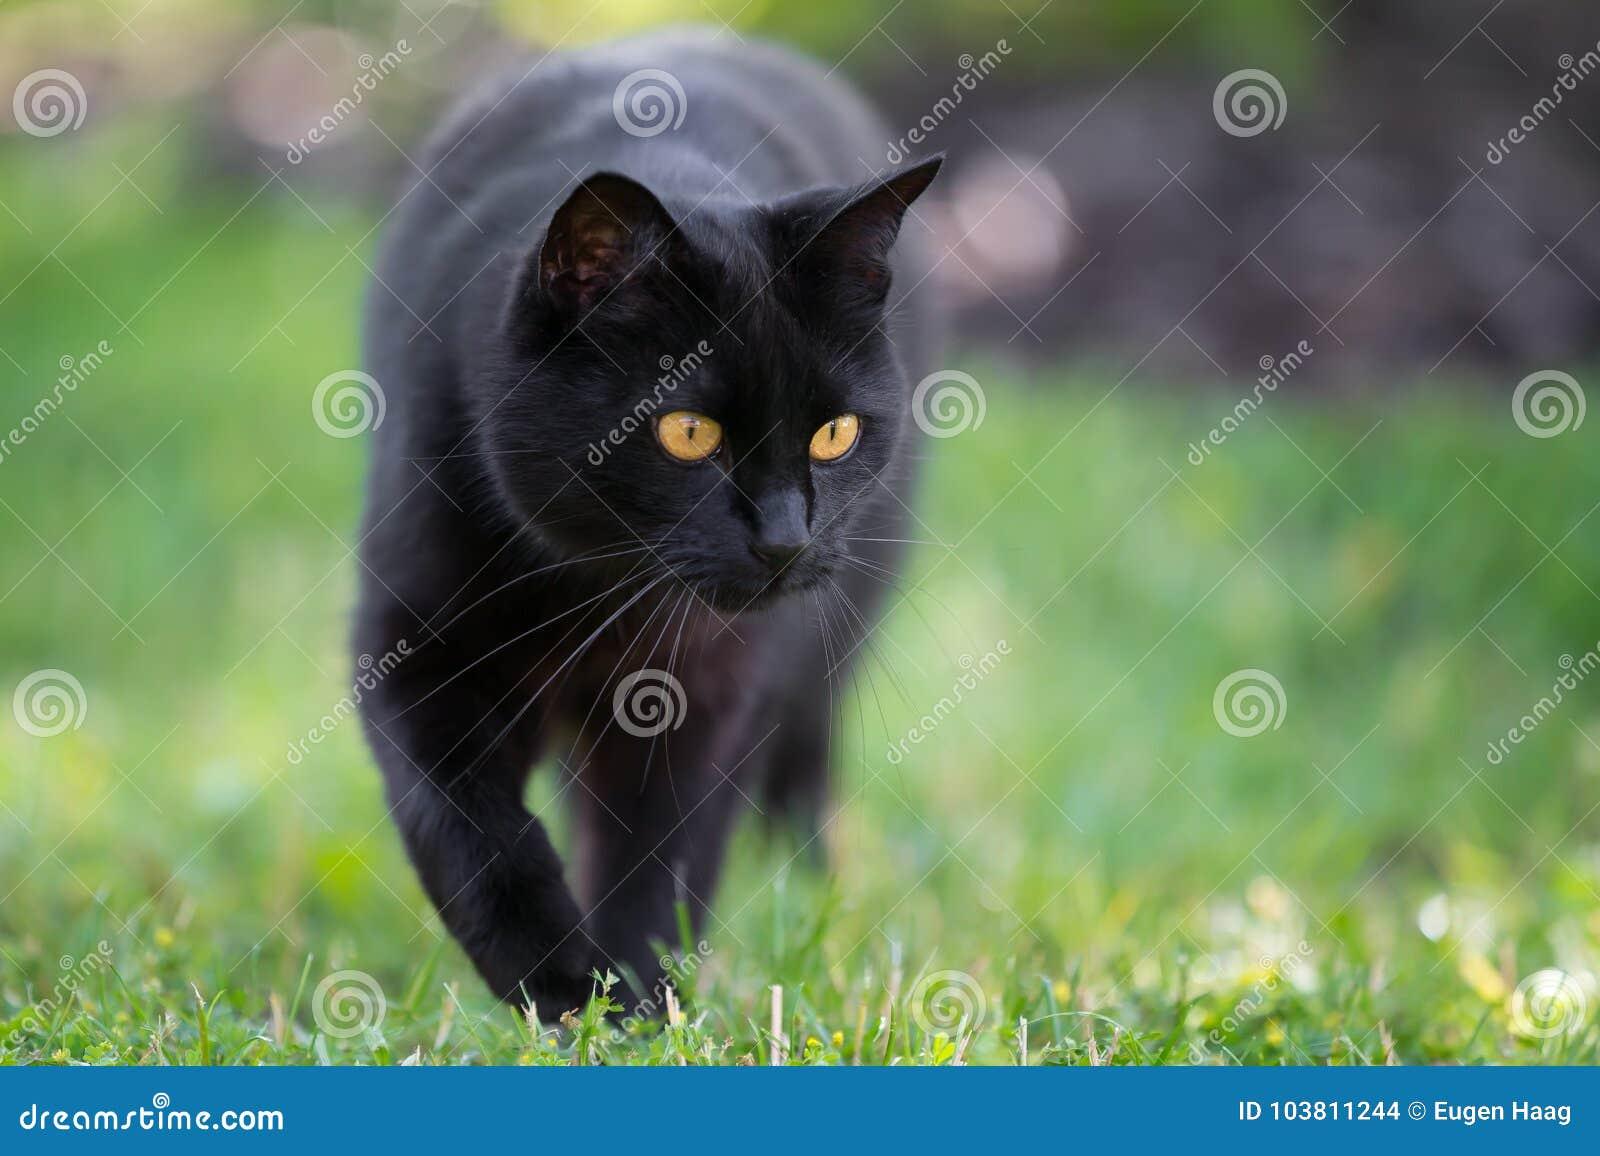 O gato preto está andando através da grama